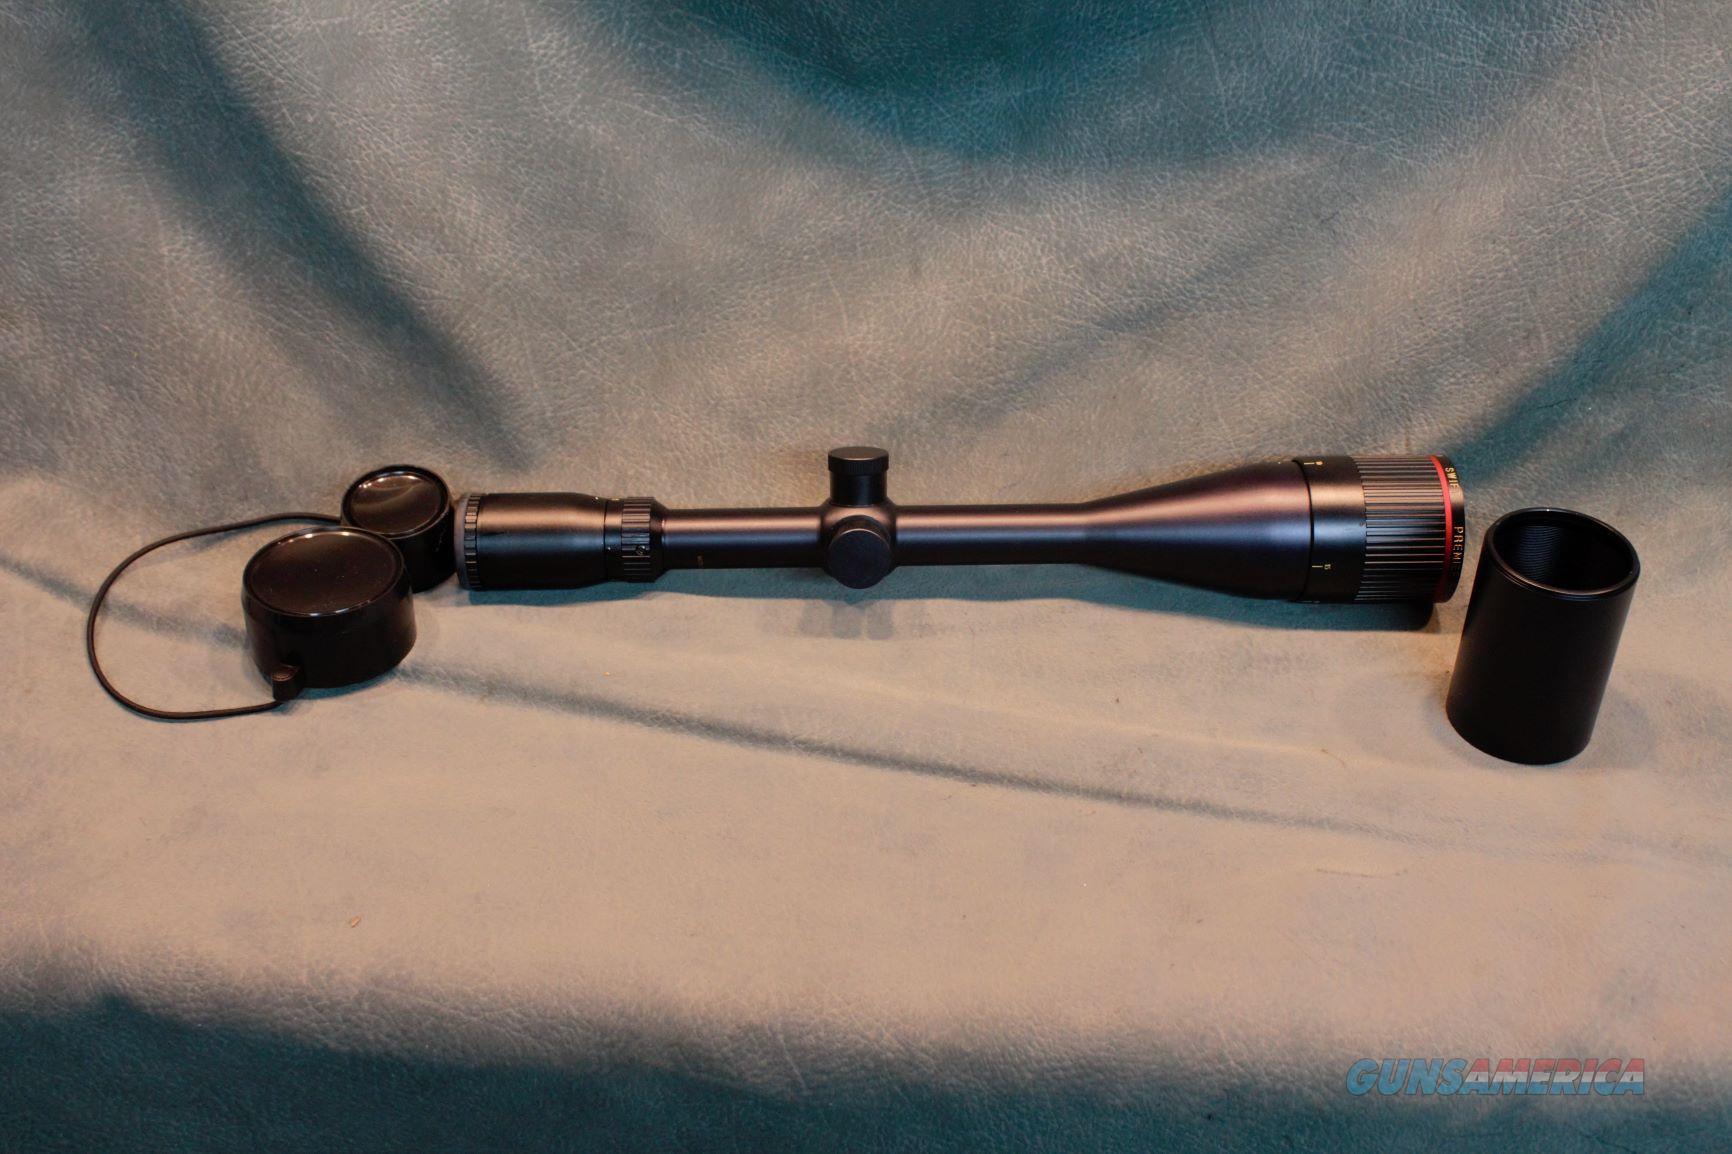 Swift 6-24x50mm Riflescope  Non-Guns > Scopes/Mounts/Rings & Optics > Rifle Scopes > Variable Focal Length